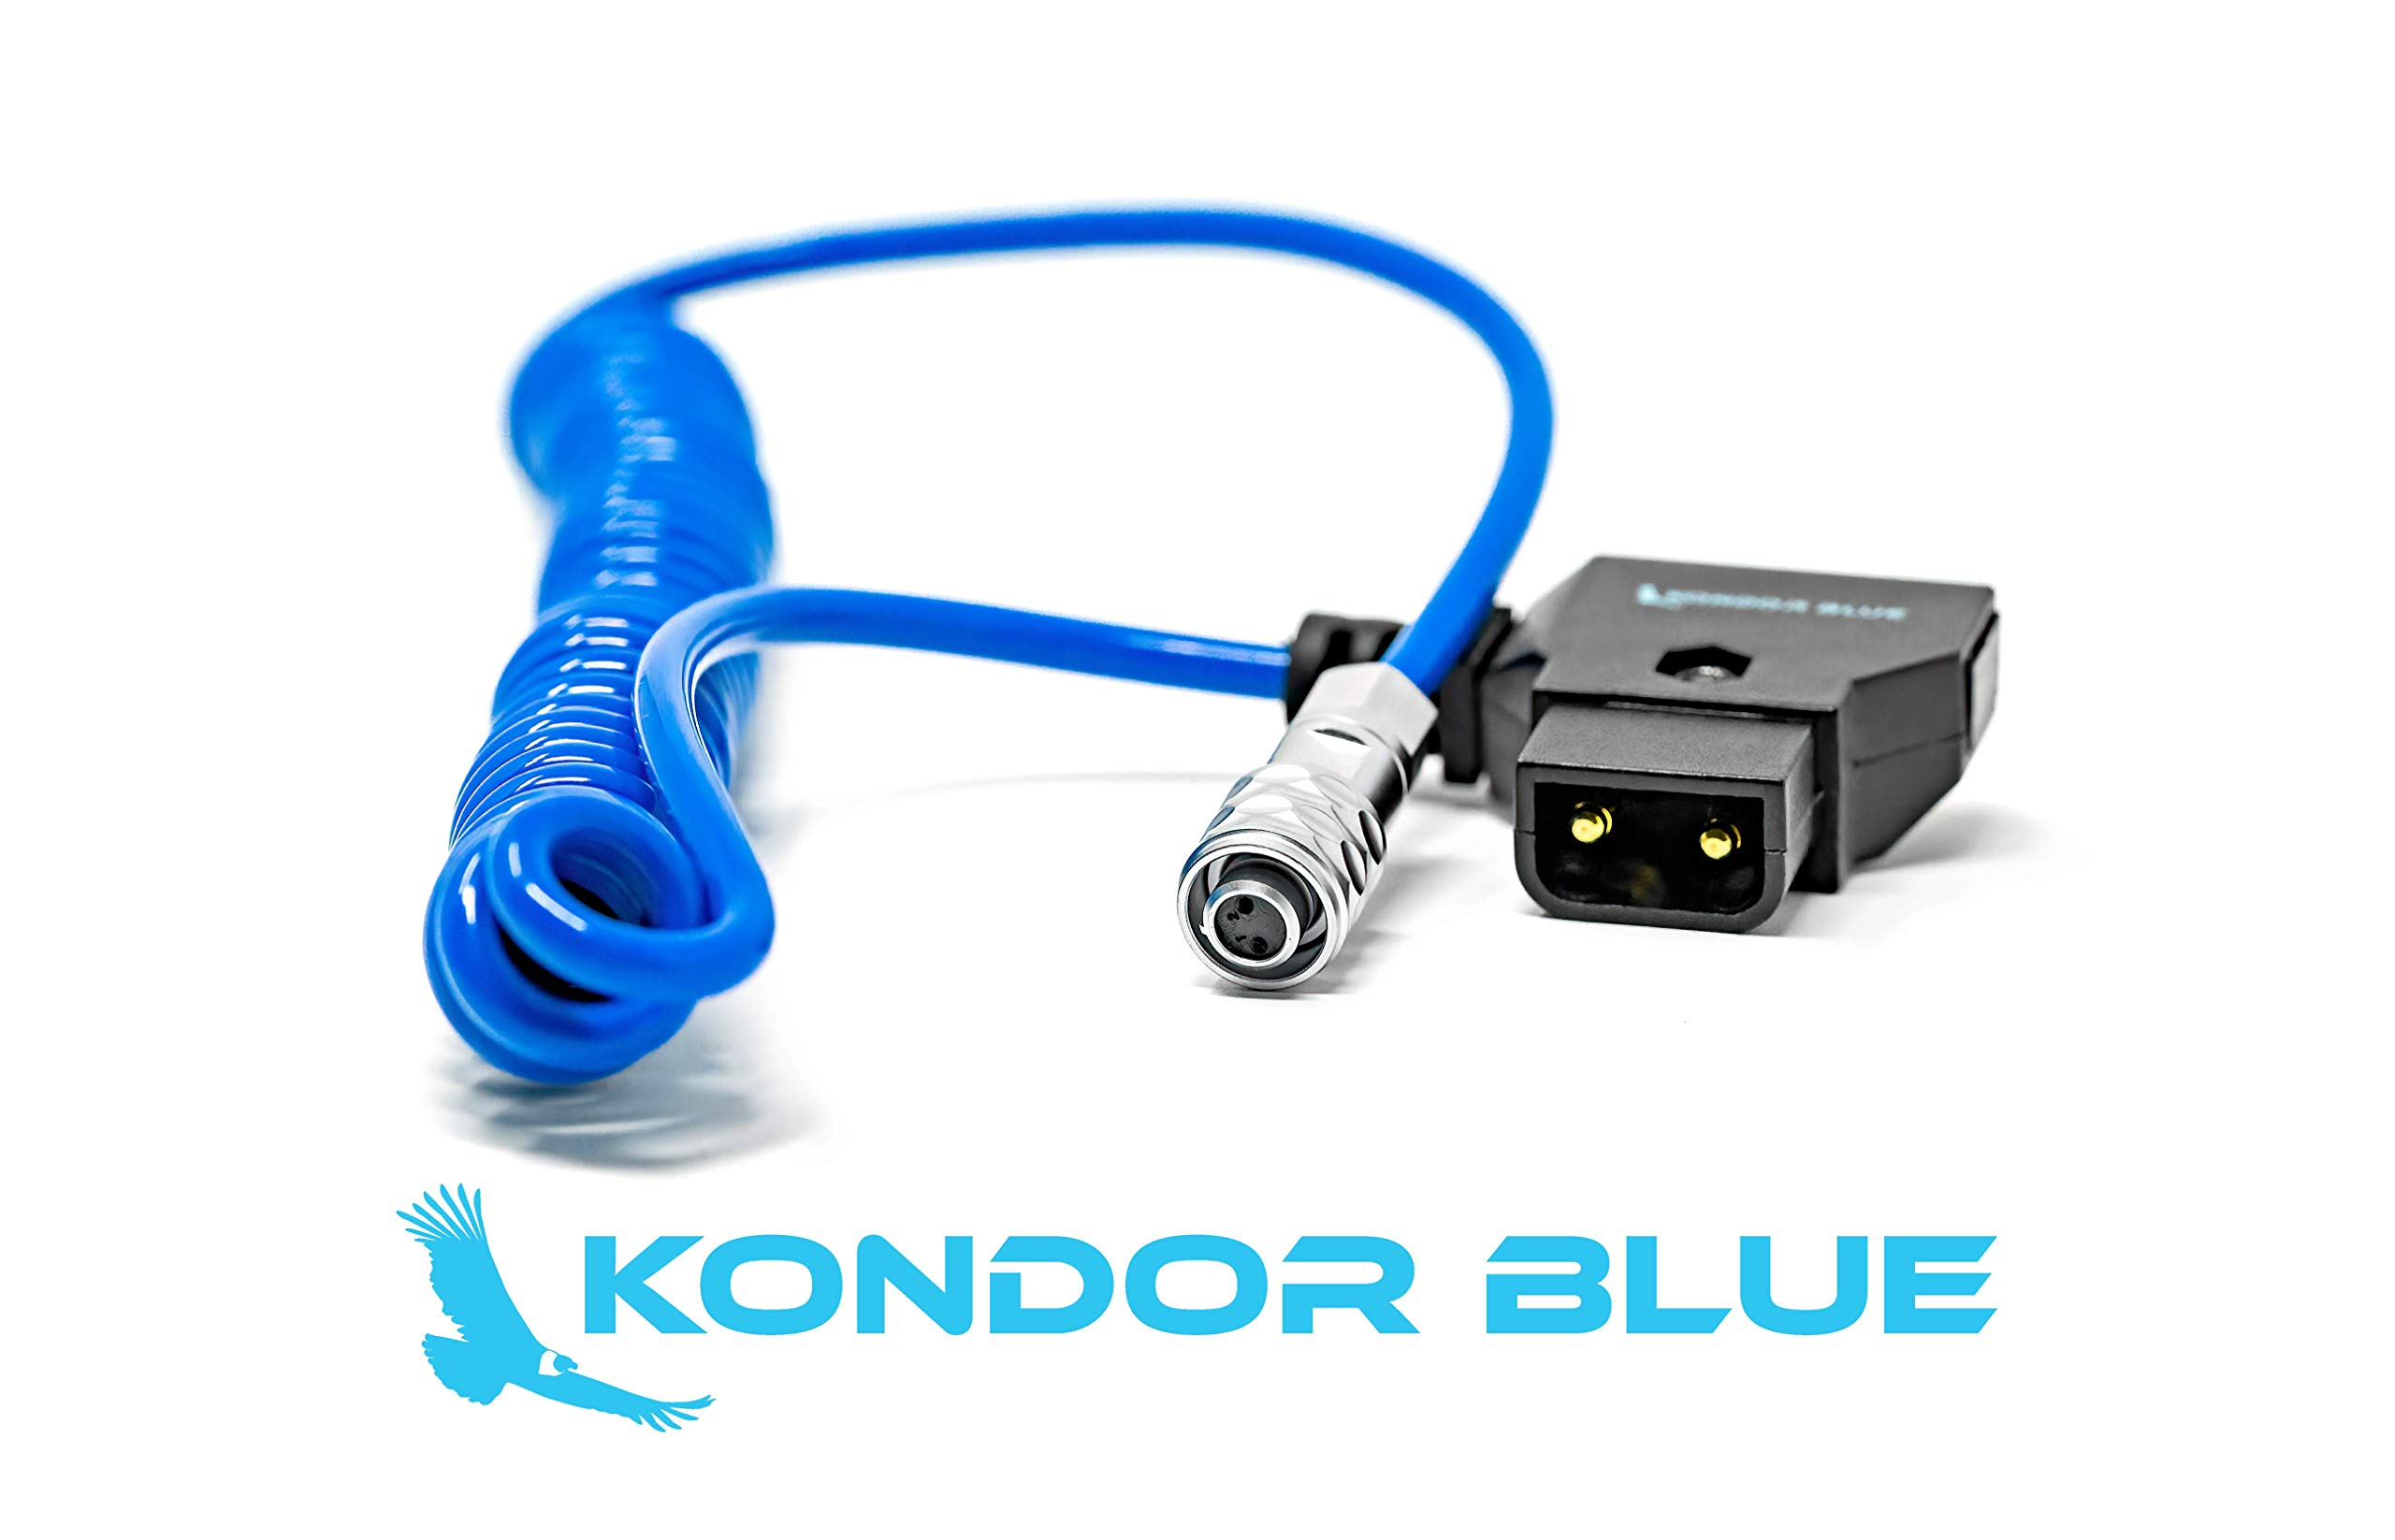 KONDOR BLUE 20'' Coiled D-Tap to BMPCC 6K/4K Weipu Power Cable for Blackmagic Pocket Cinema Camera 4K Gold Mount V Mount Battery P TAP